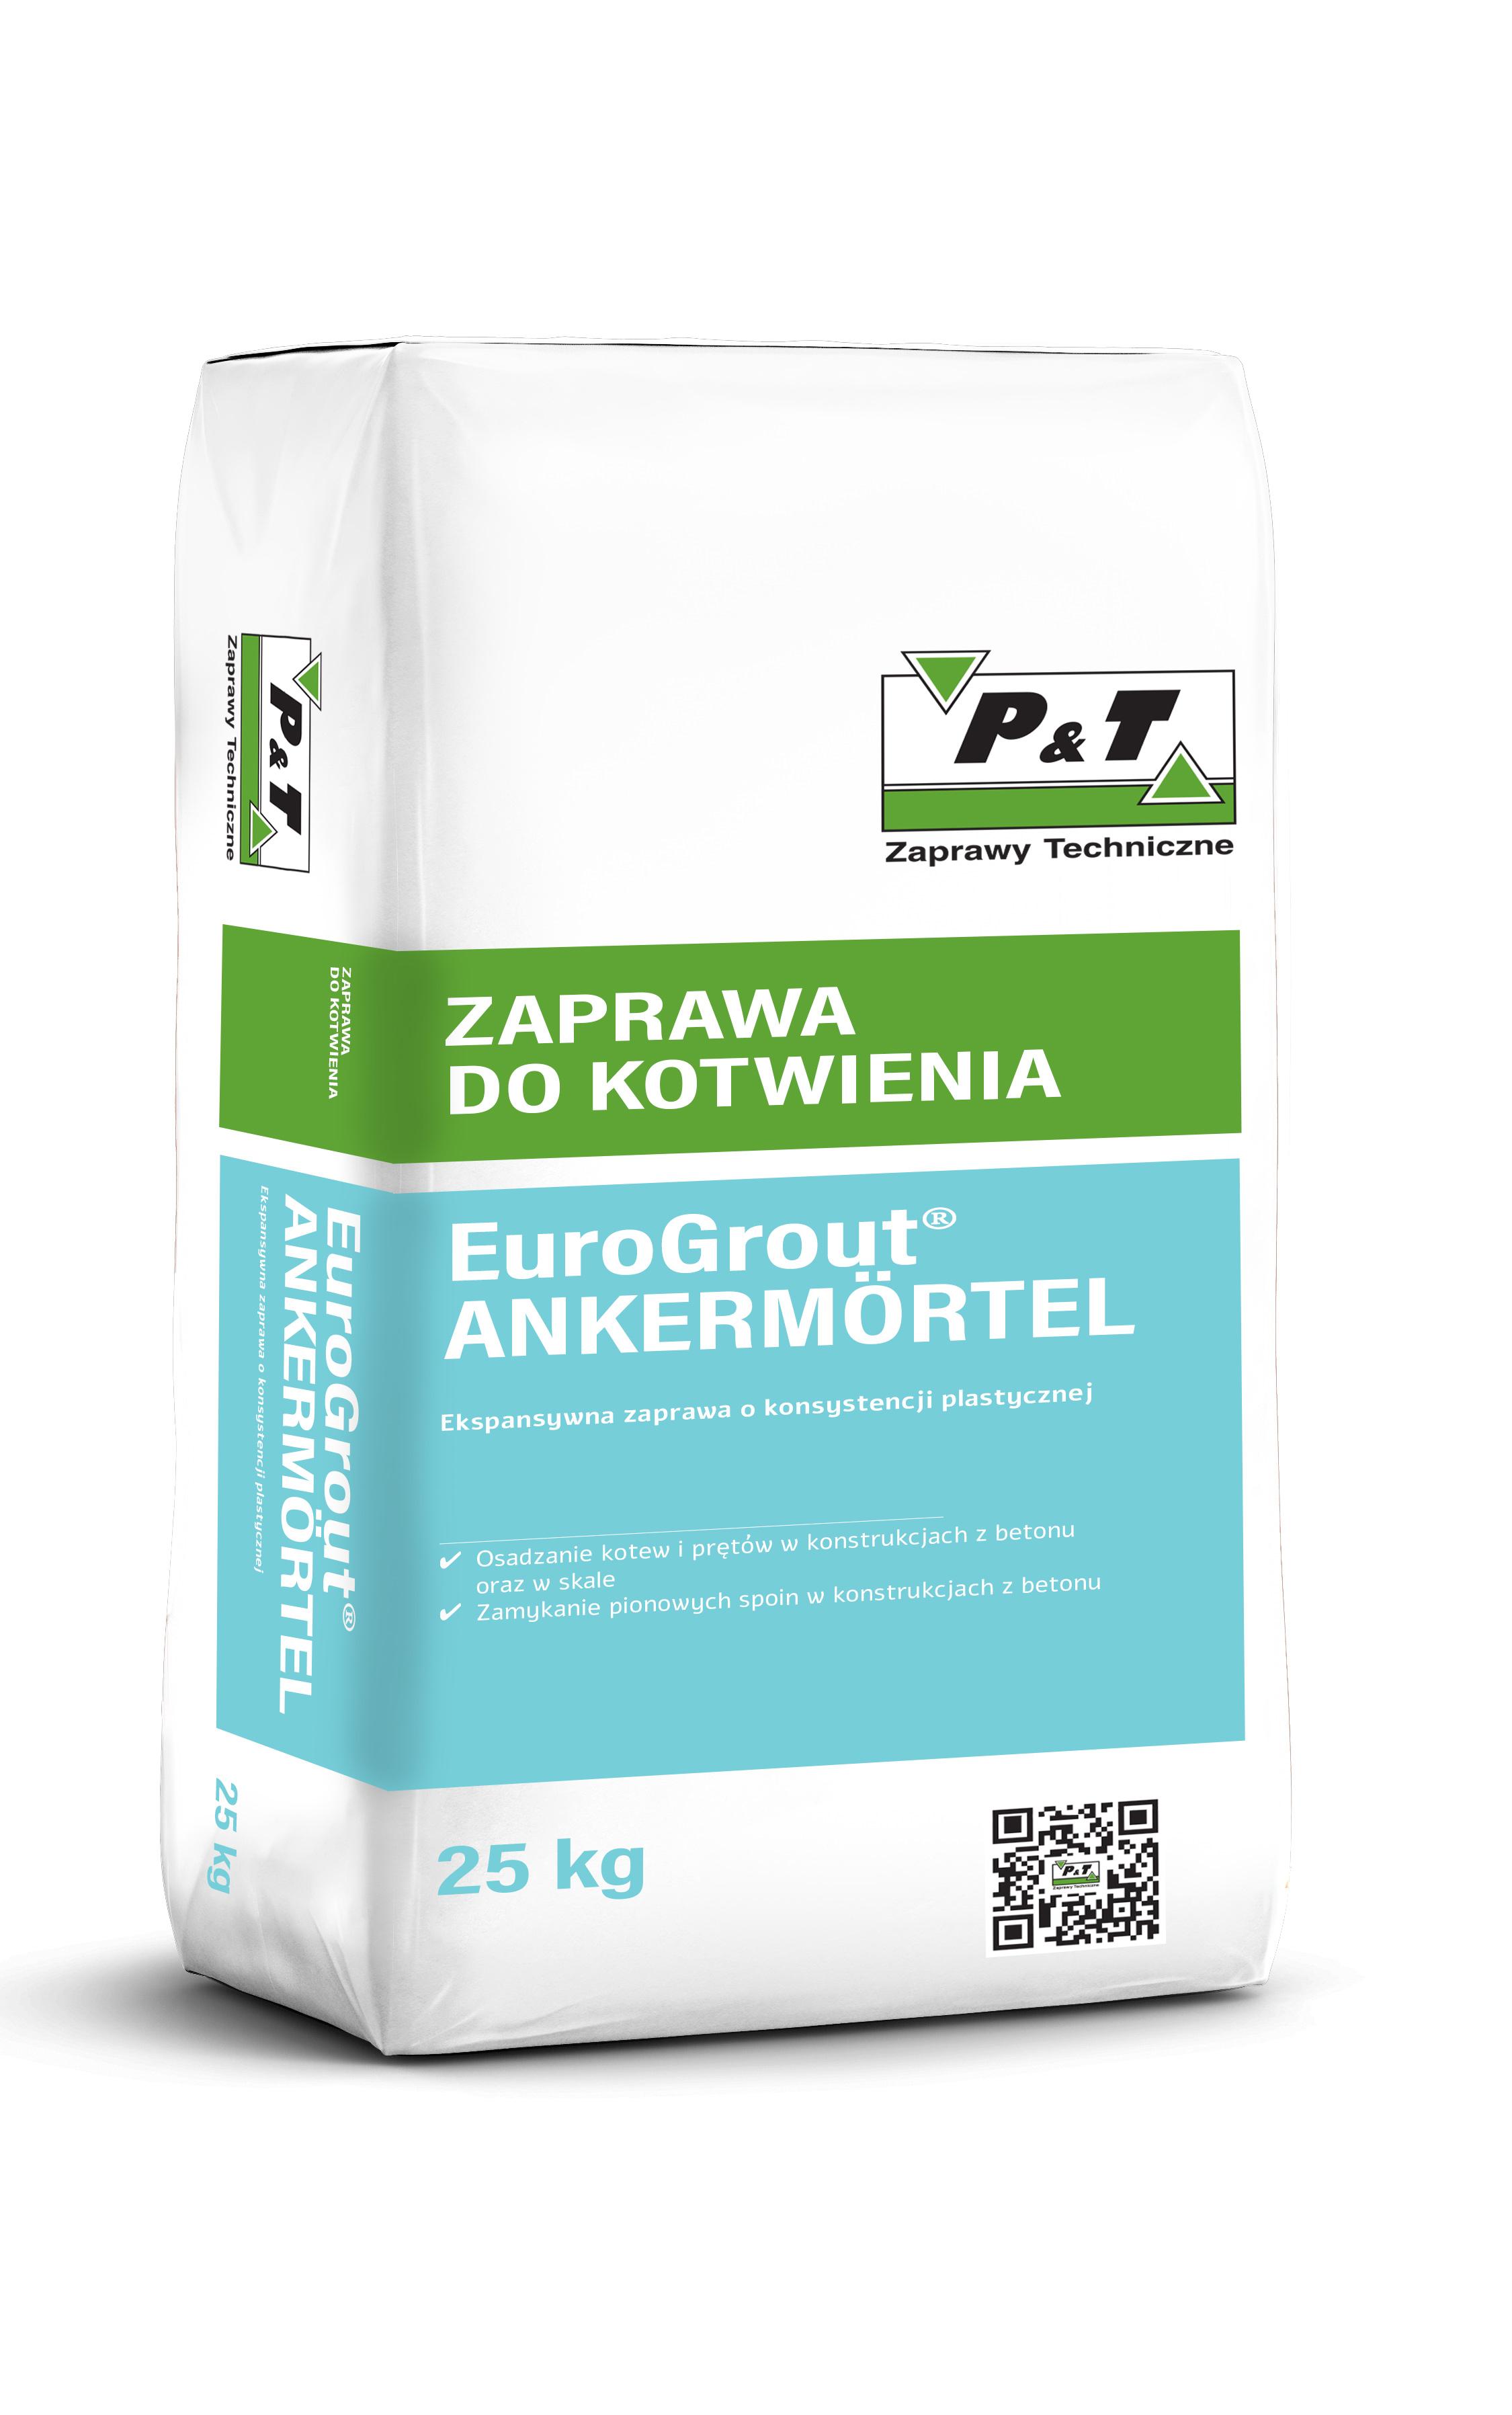 EuroGrout Ankermörtel